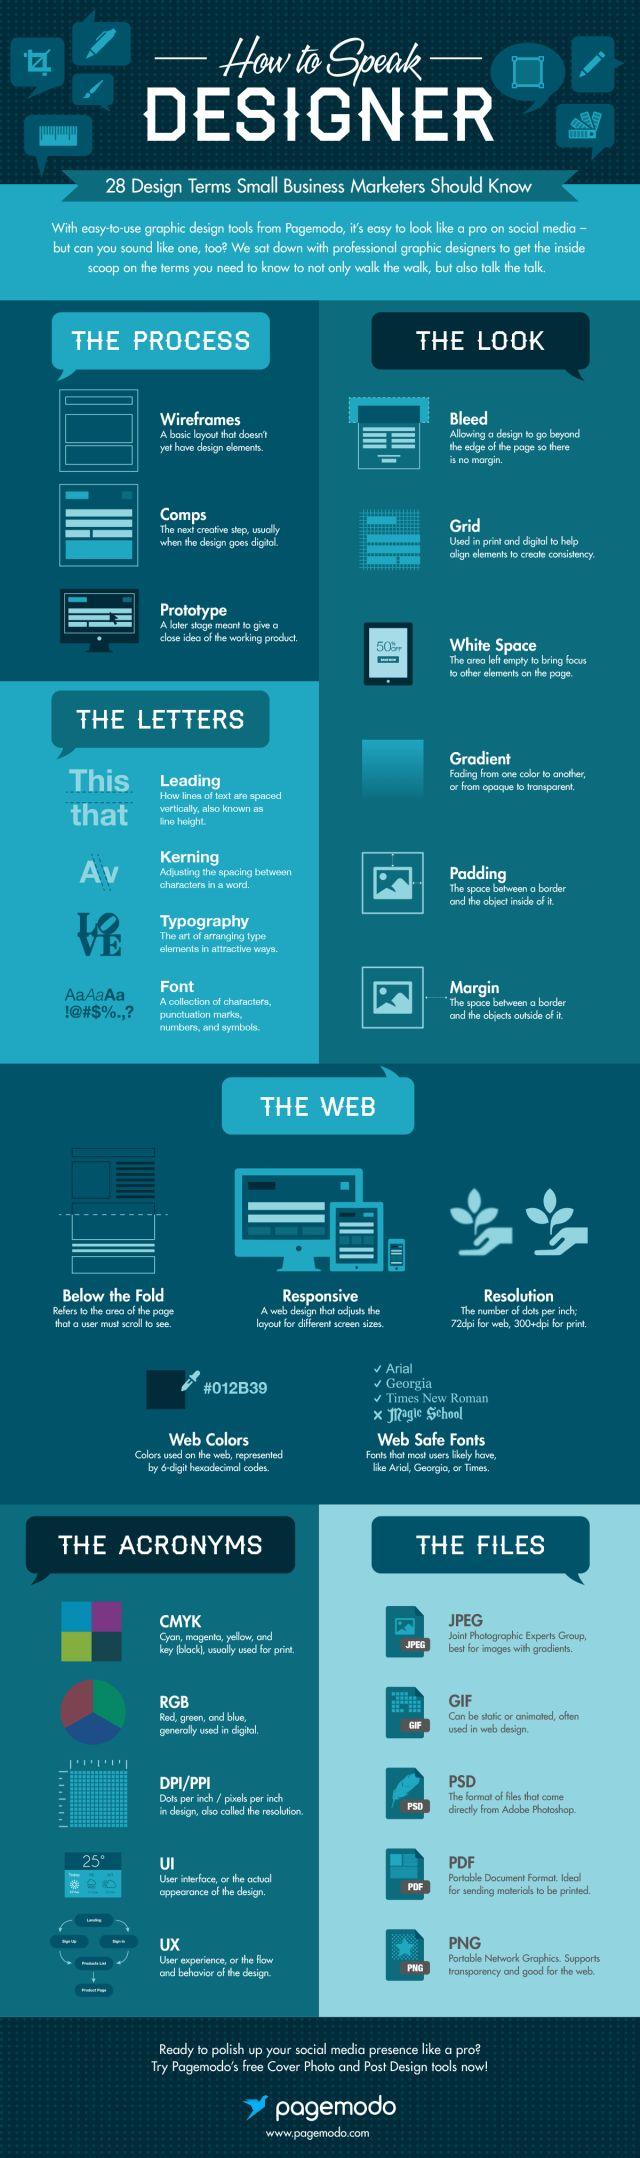 Designer Terminology: Fonts, Files, Acronyms and Layout Definitions #searchengineoptimizationandadvertising,